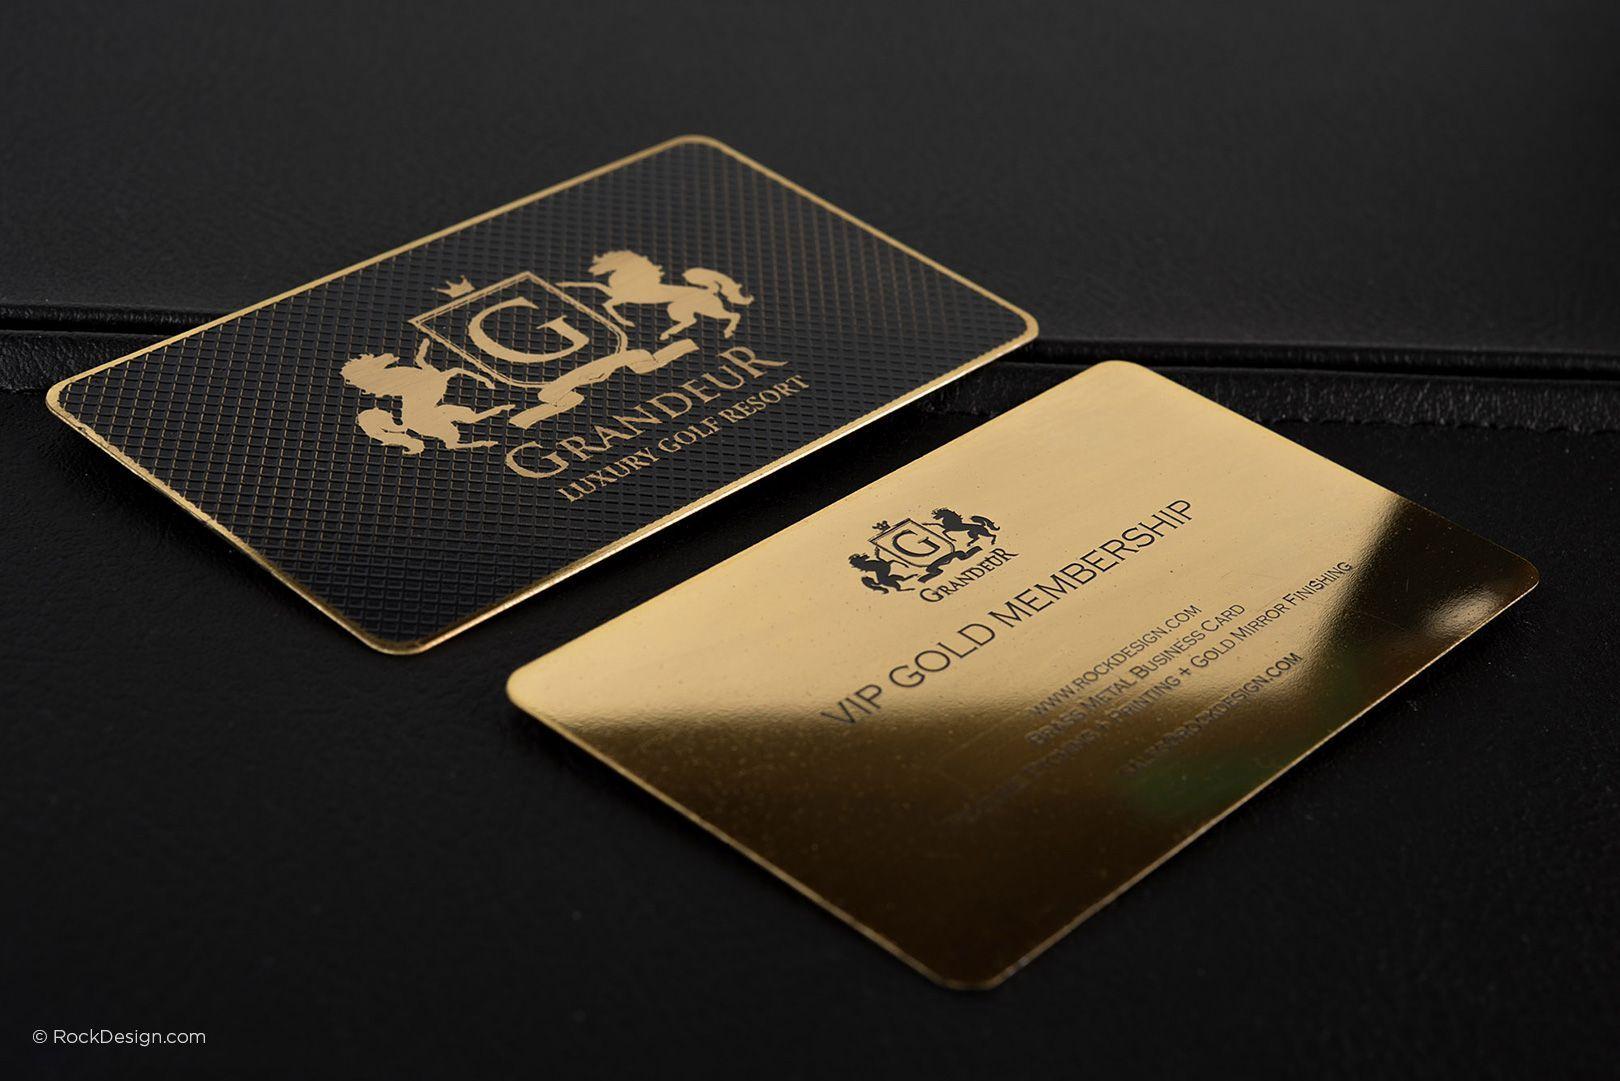 Compelling Laser Engraved Black Metal Business Card Template Design Roar Strategy Metal Business Cards Luxury Business Cards Printing Business Cards